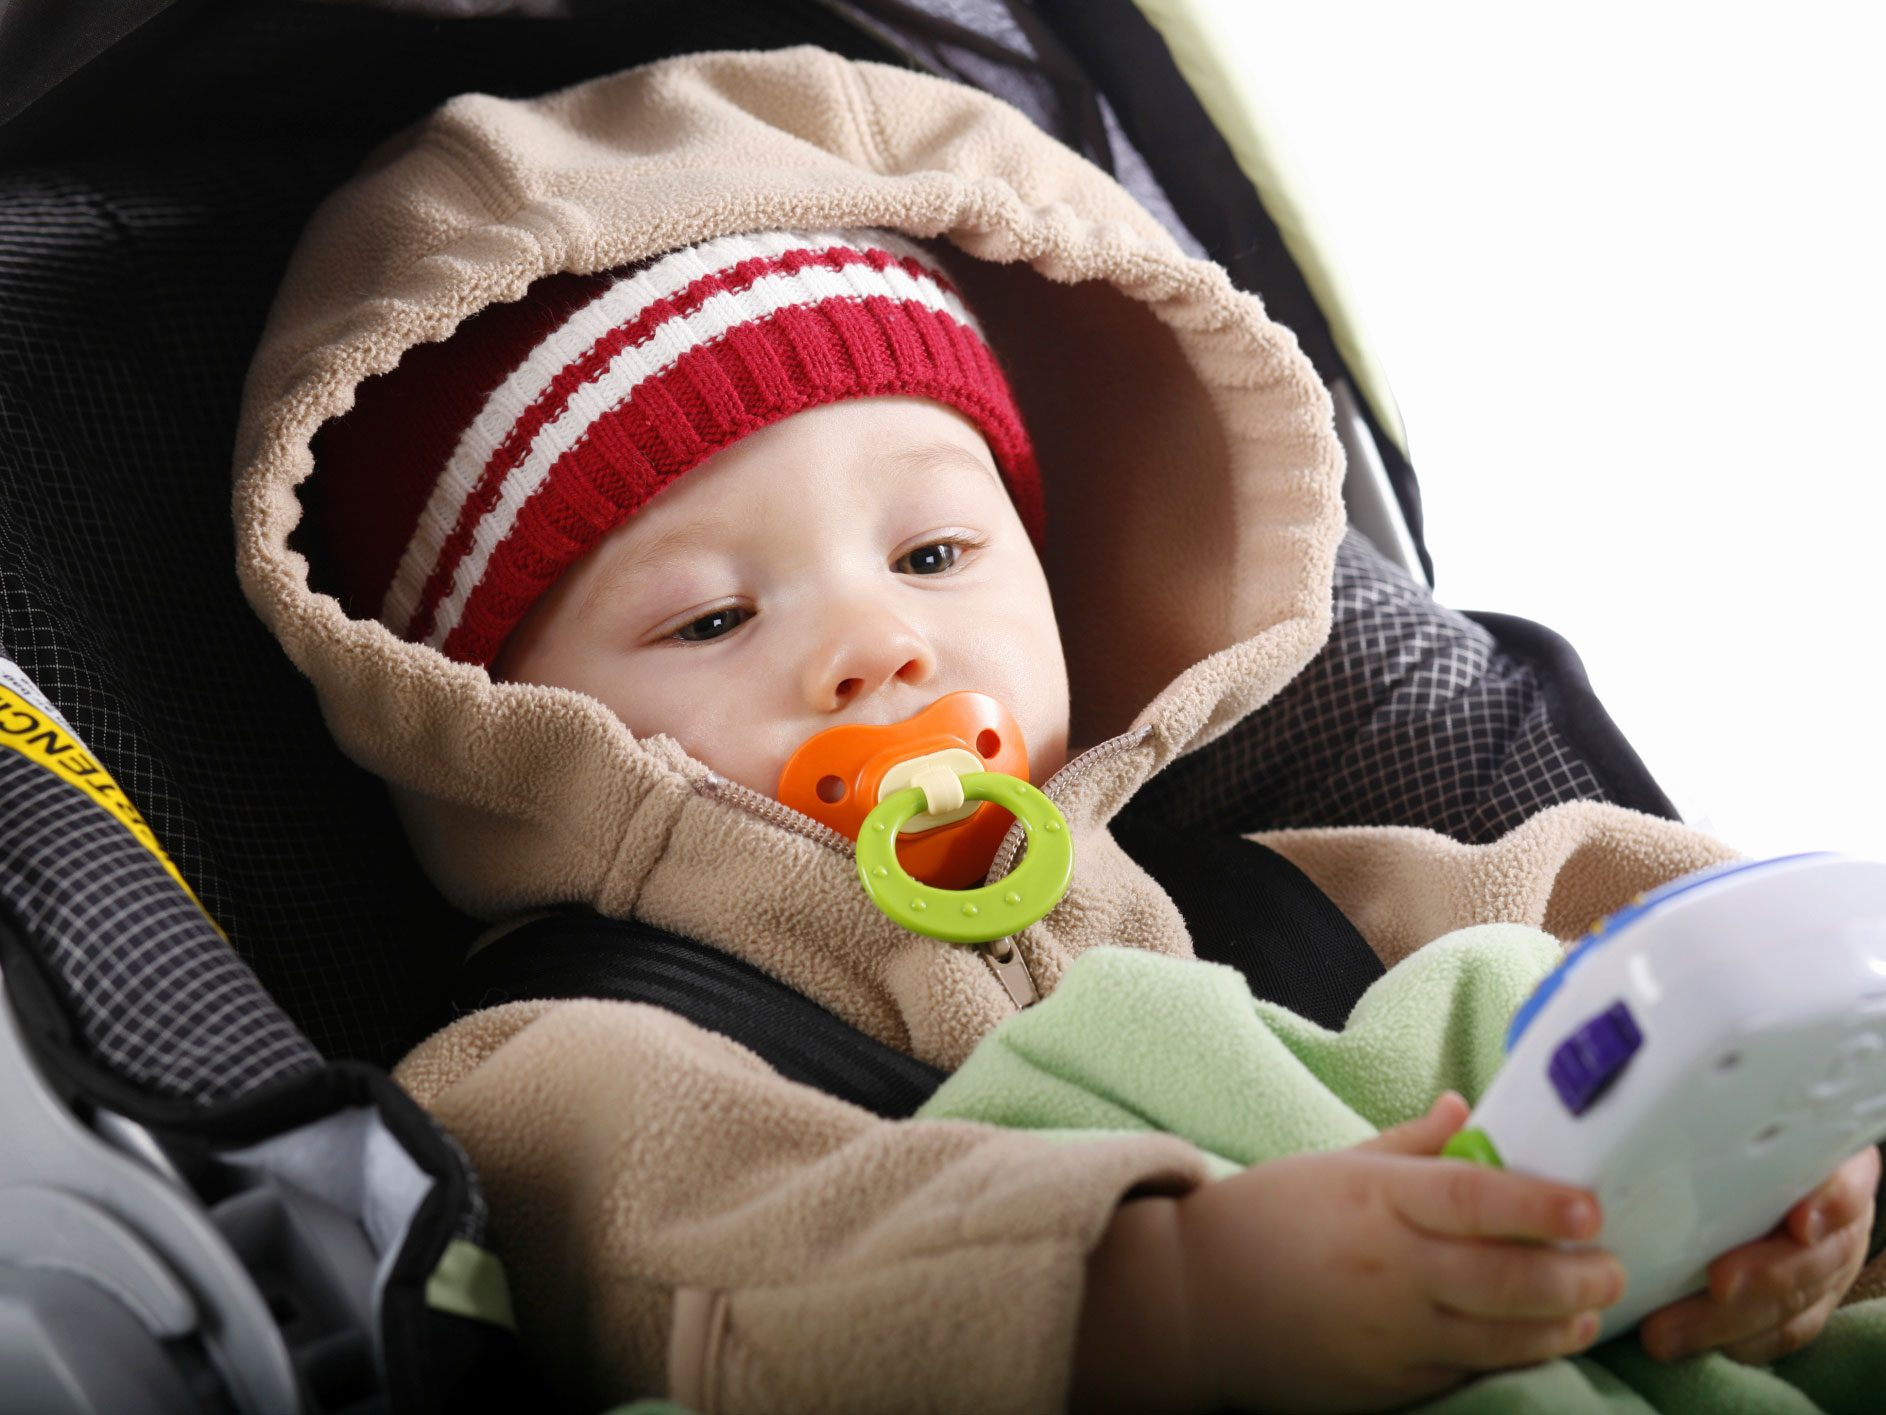 Avoid Bulky Clothing in Car Seats